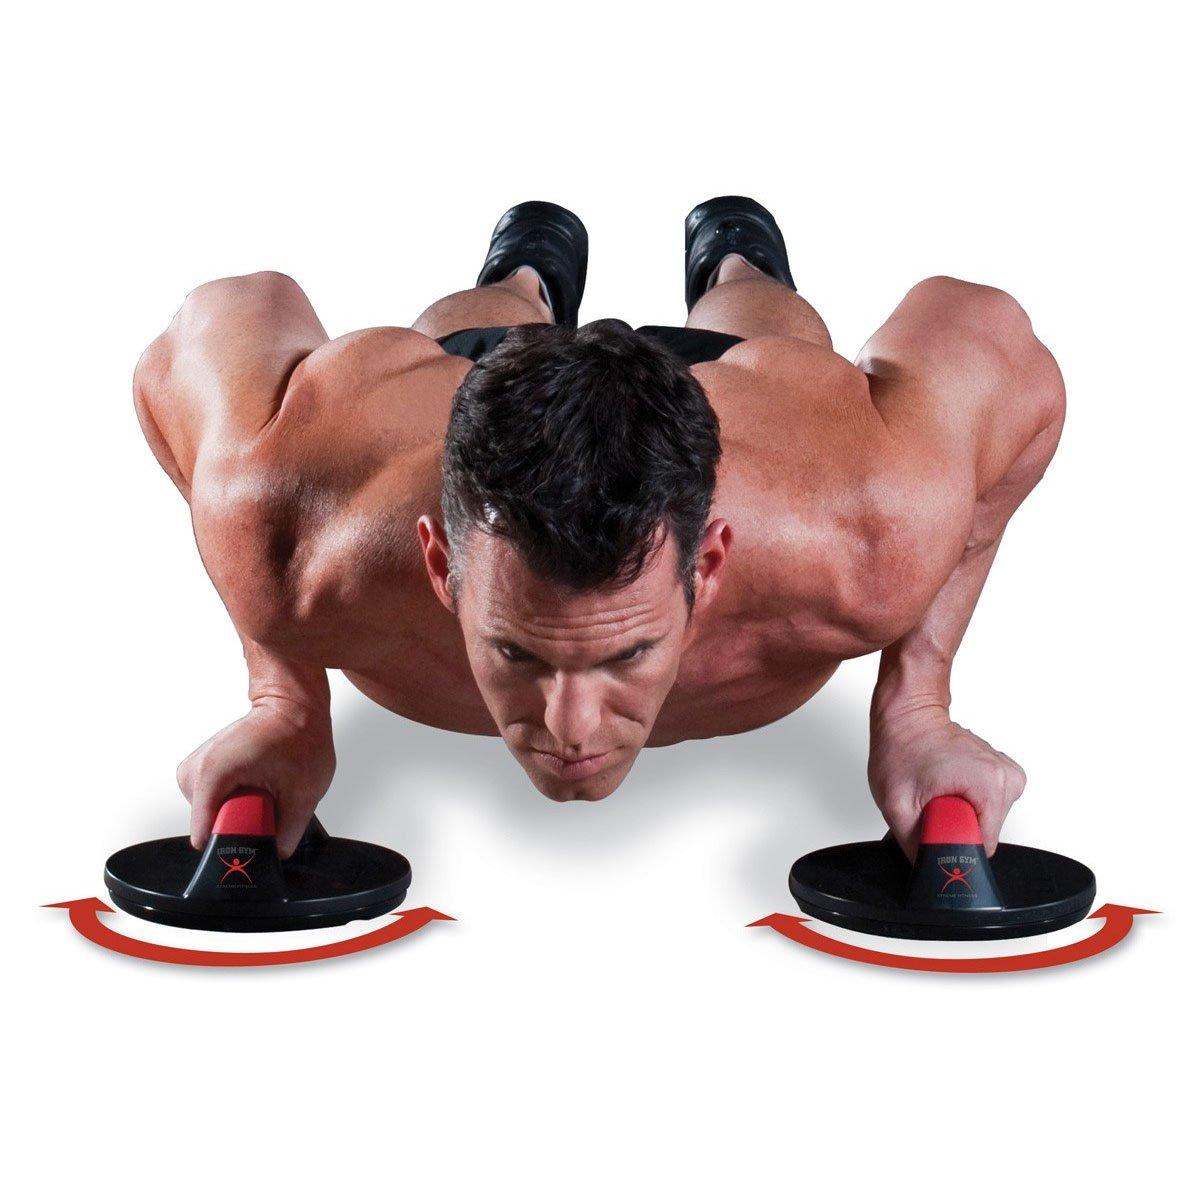 Orange Planet Iron Gym Push Up Max